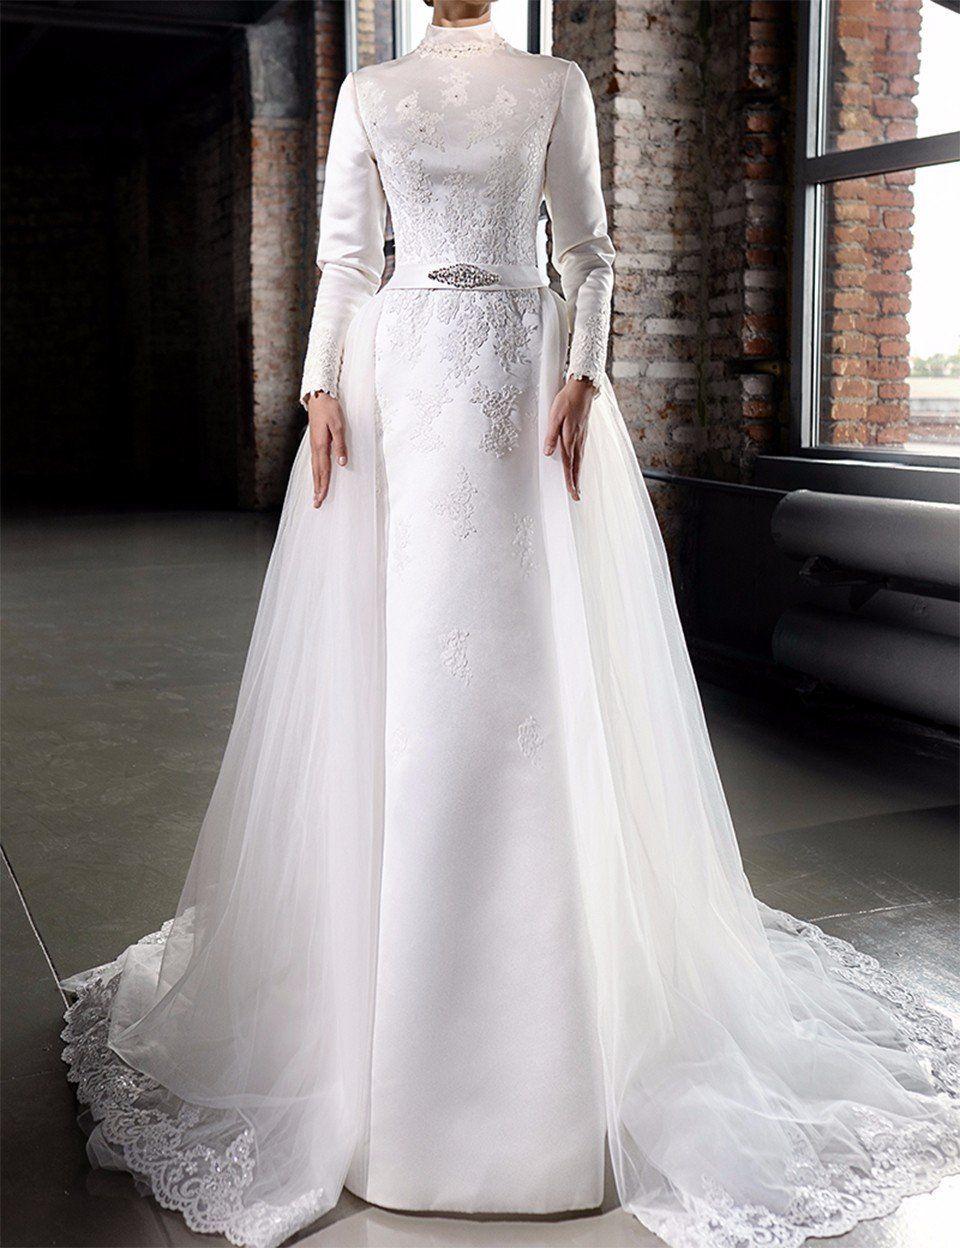 Vintage Satin Hijab Muslim Wedding Dresses Luxury Beaded Lace High Neck Detachable Train Long Sleeve Muslim Wedding Dresses Bridal Ball Gown Wedding Dresses [ 1248 x 960 Pixel ]